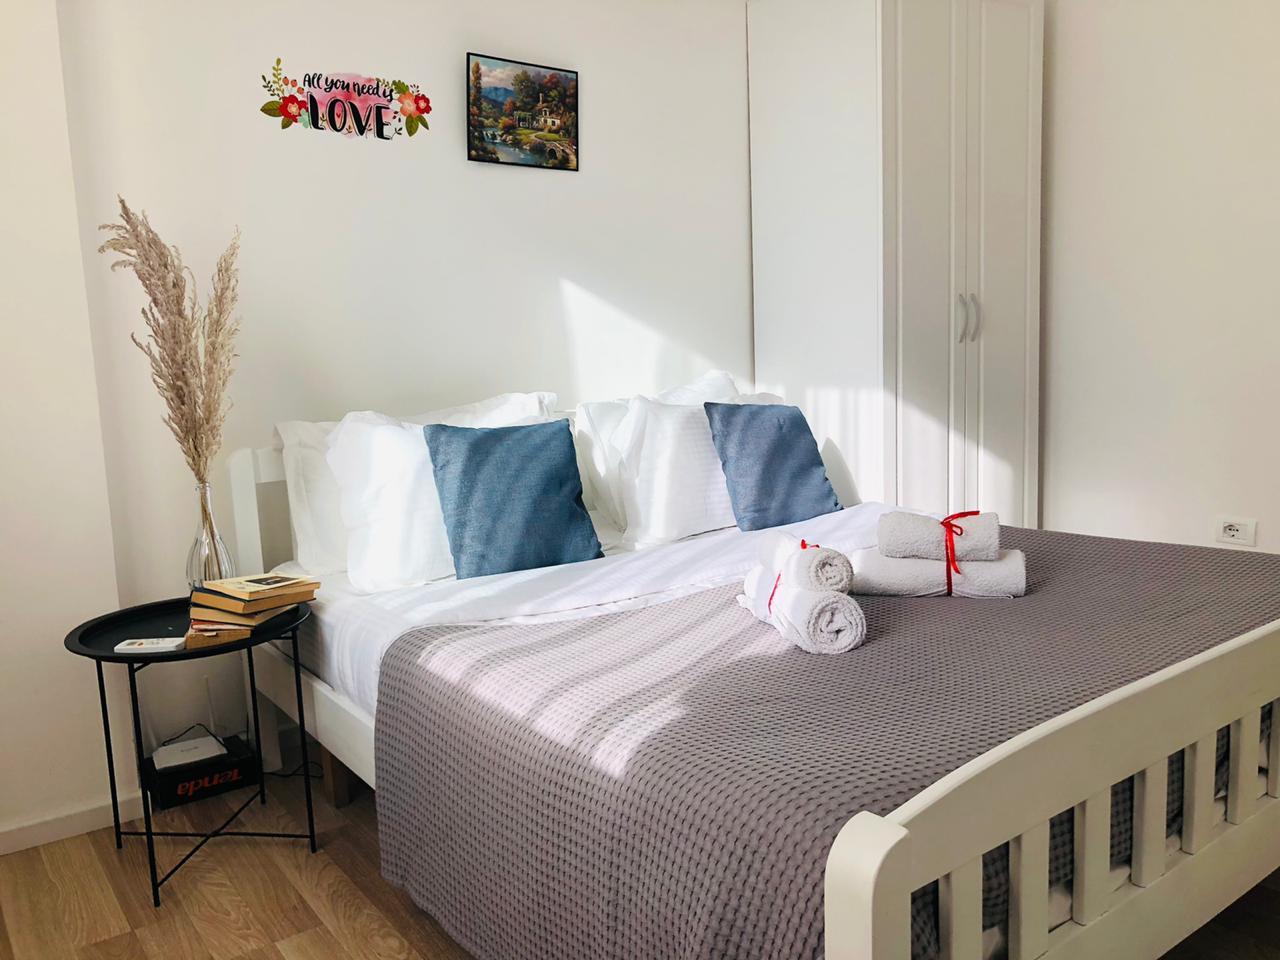 Dhome me qera ditore ne Tirane